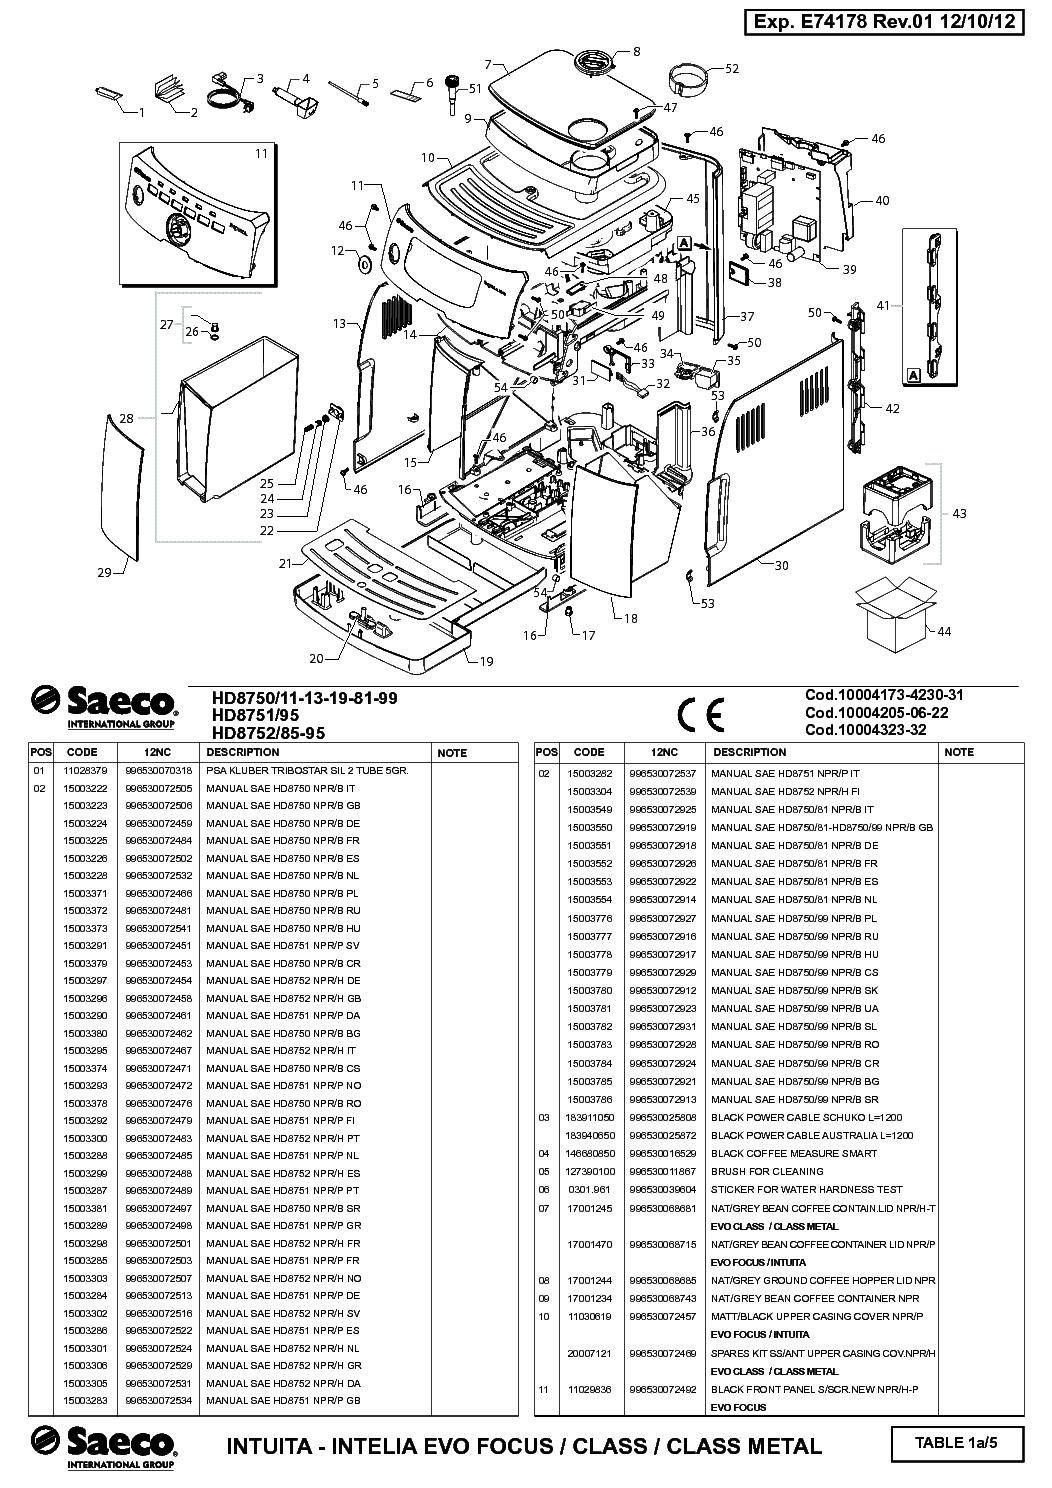 Coffee Maker Service Manual : PHILIPS SAECO HD8750 HD8751 HD8752 ESPRESSO MAKER Service Manual download, schematics, eeprom ...